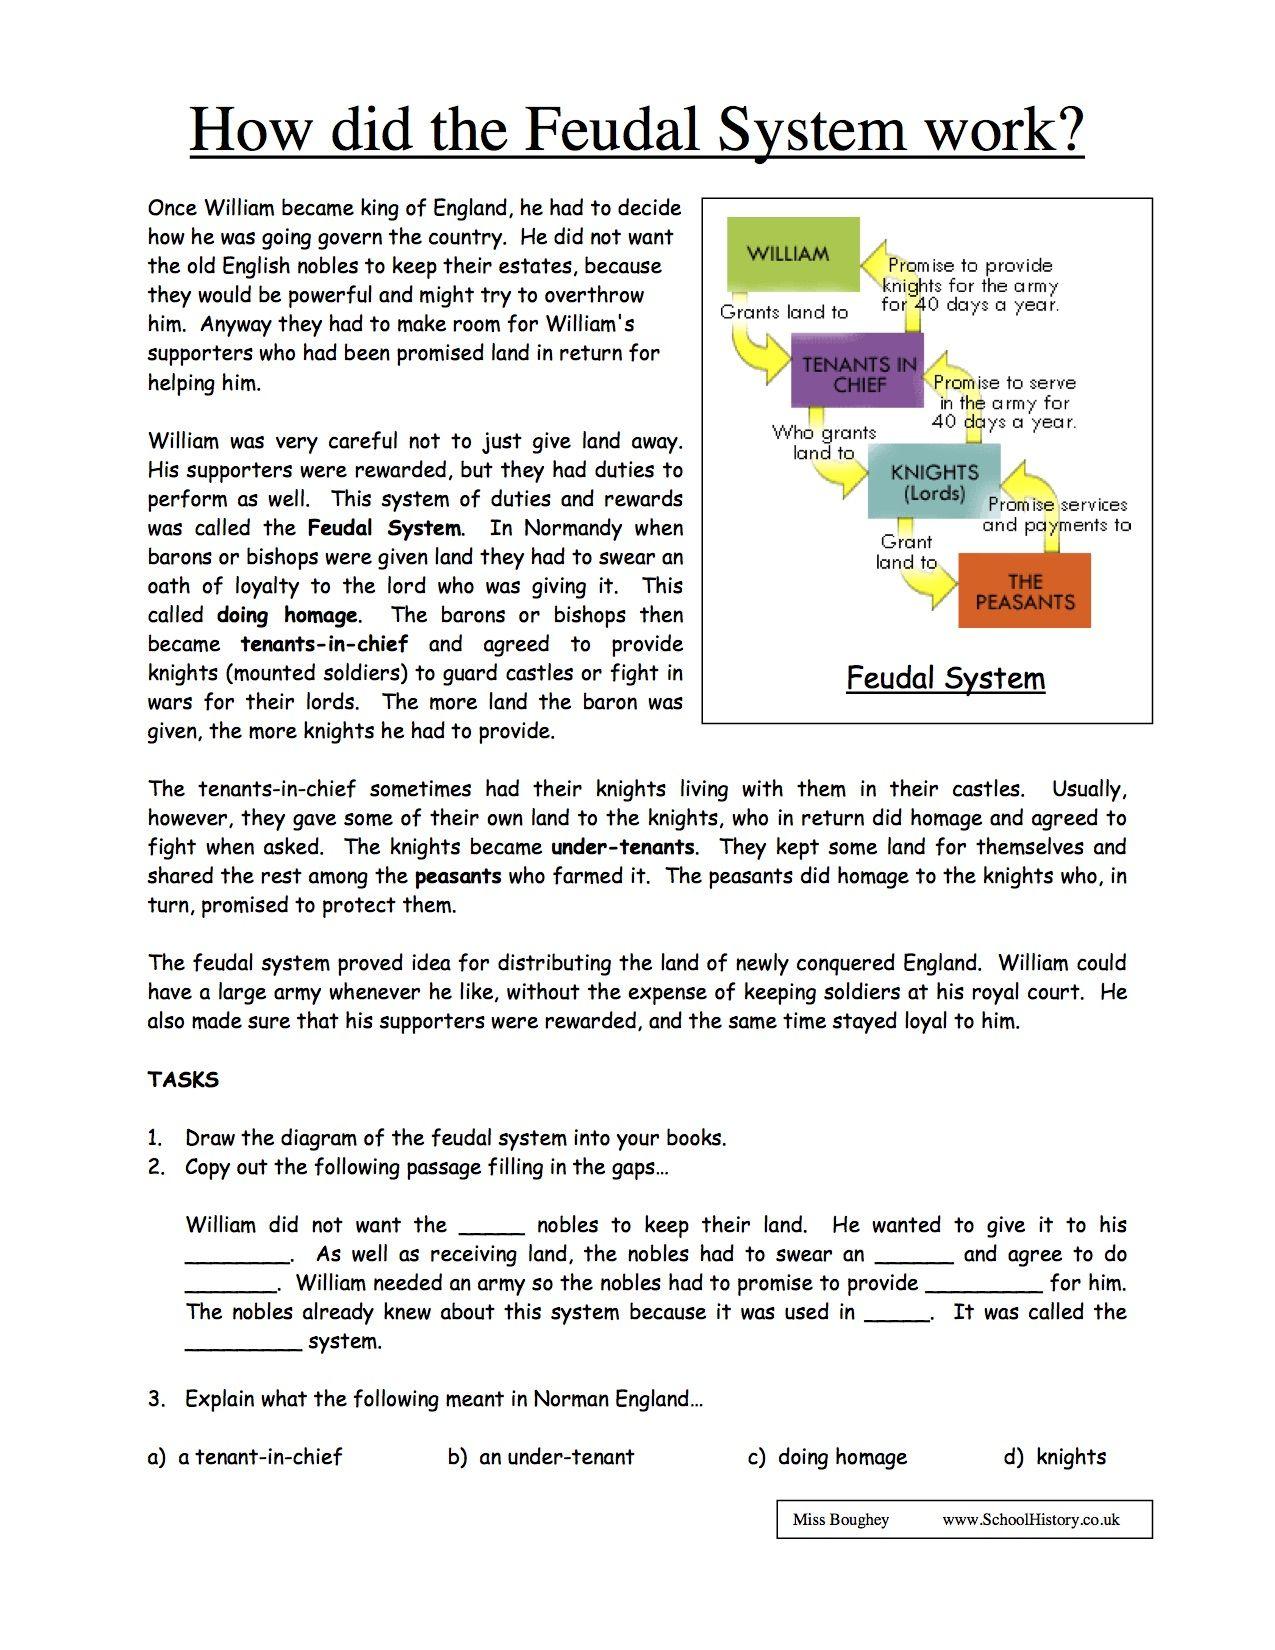 Free History Worksheets | Ks3 & Ks4 Lesson Plans & Resources | Geography Worksheets Ks3 Printable